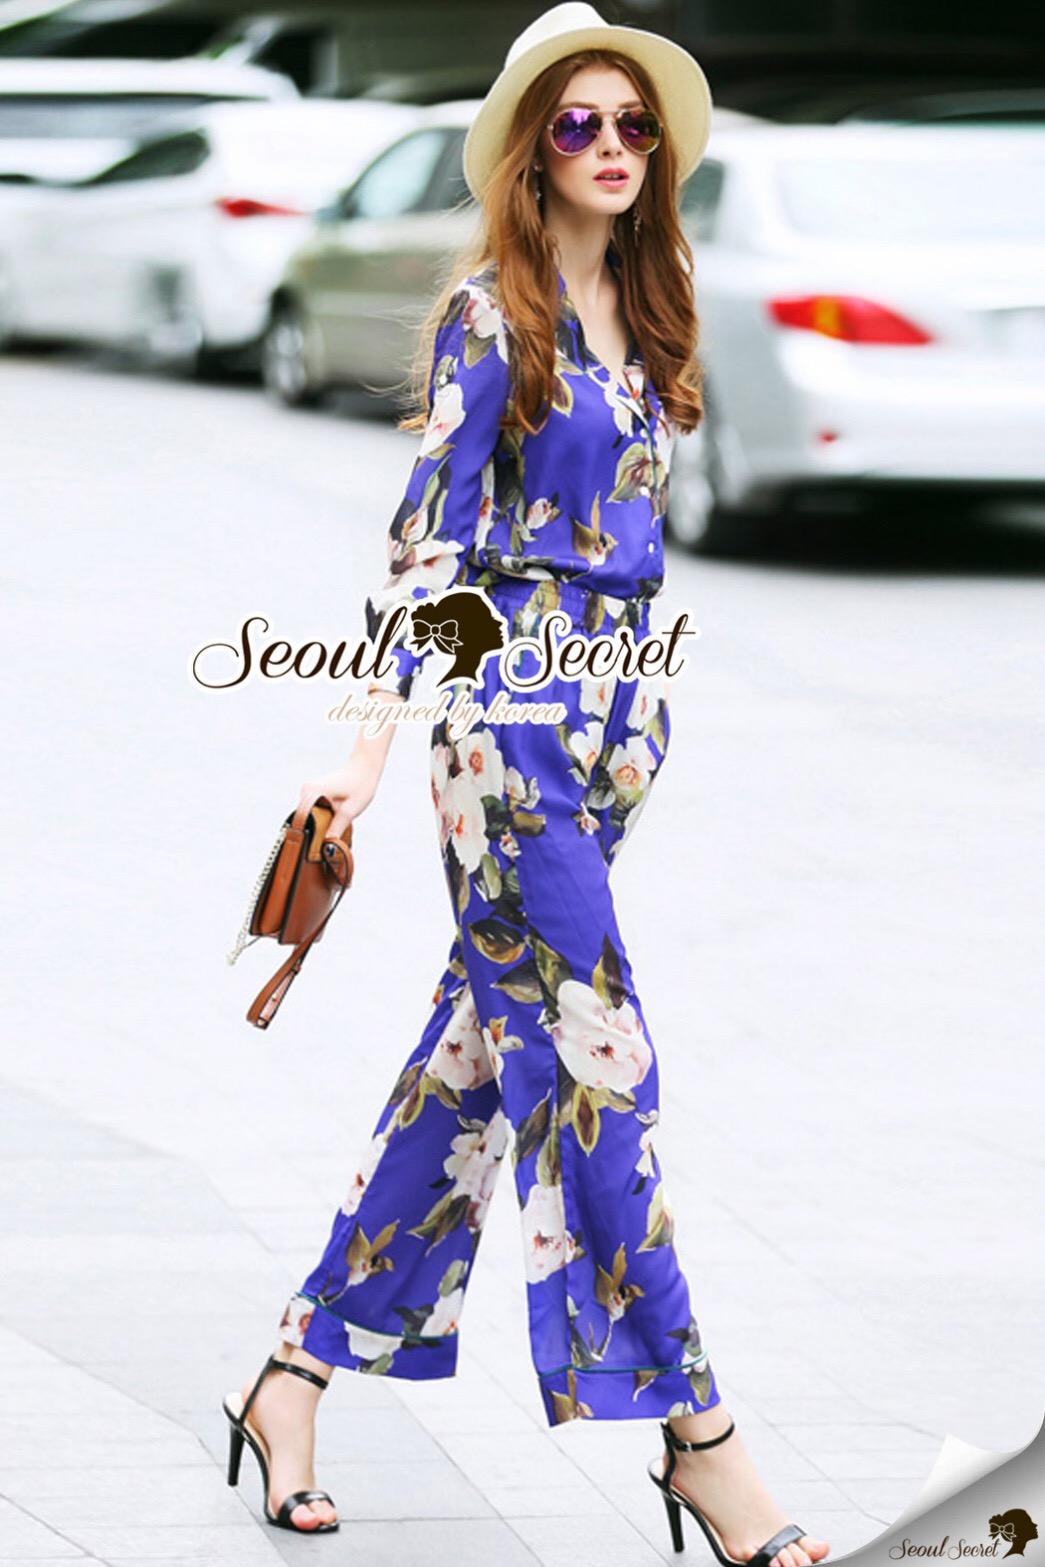 Seoul Secret Say's... Violeta Flora Fashly Smocking Set